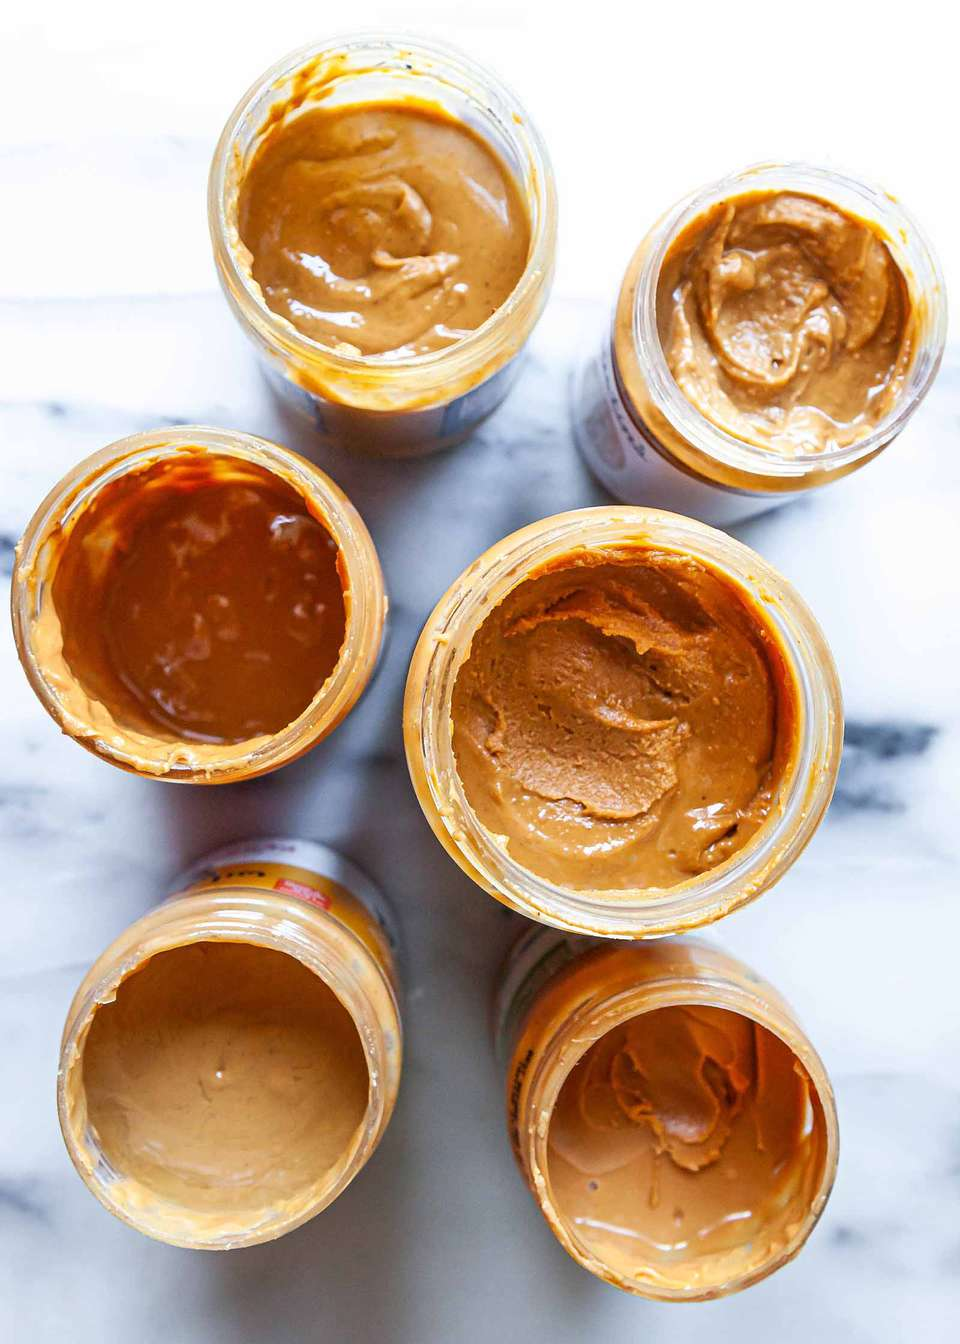 Best way to stir a jar of natural peanut buter